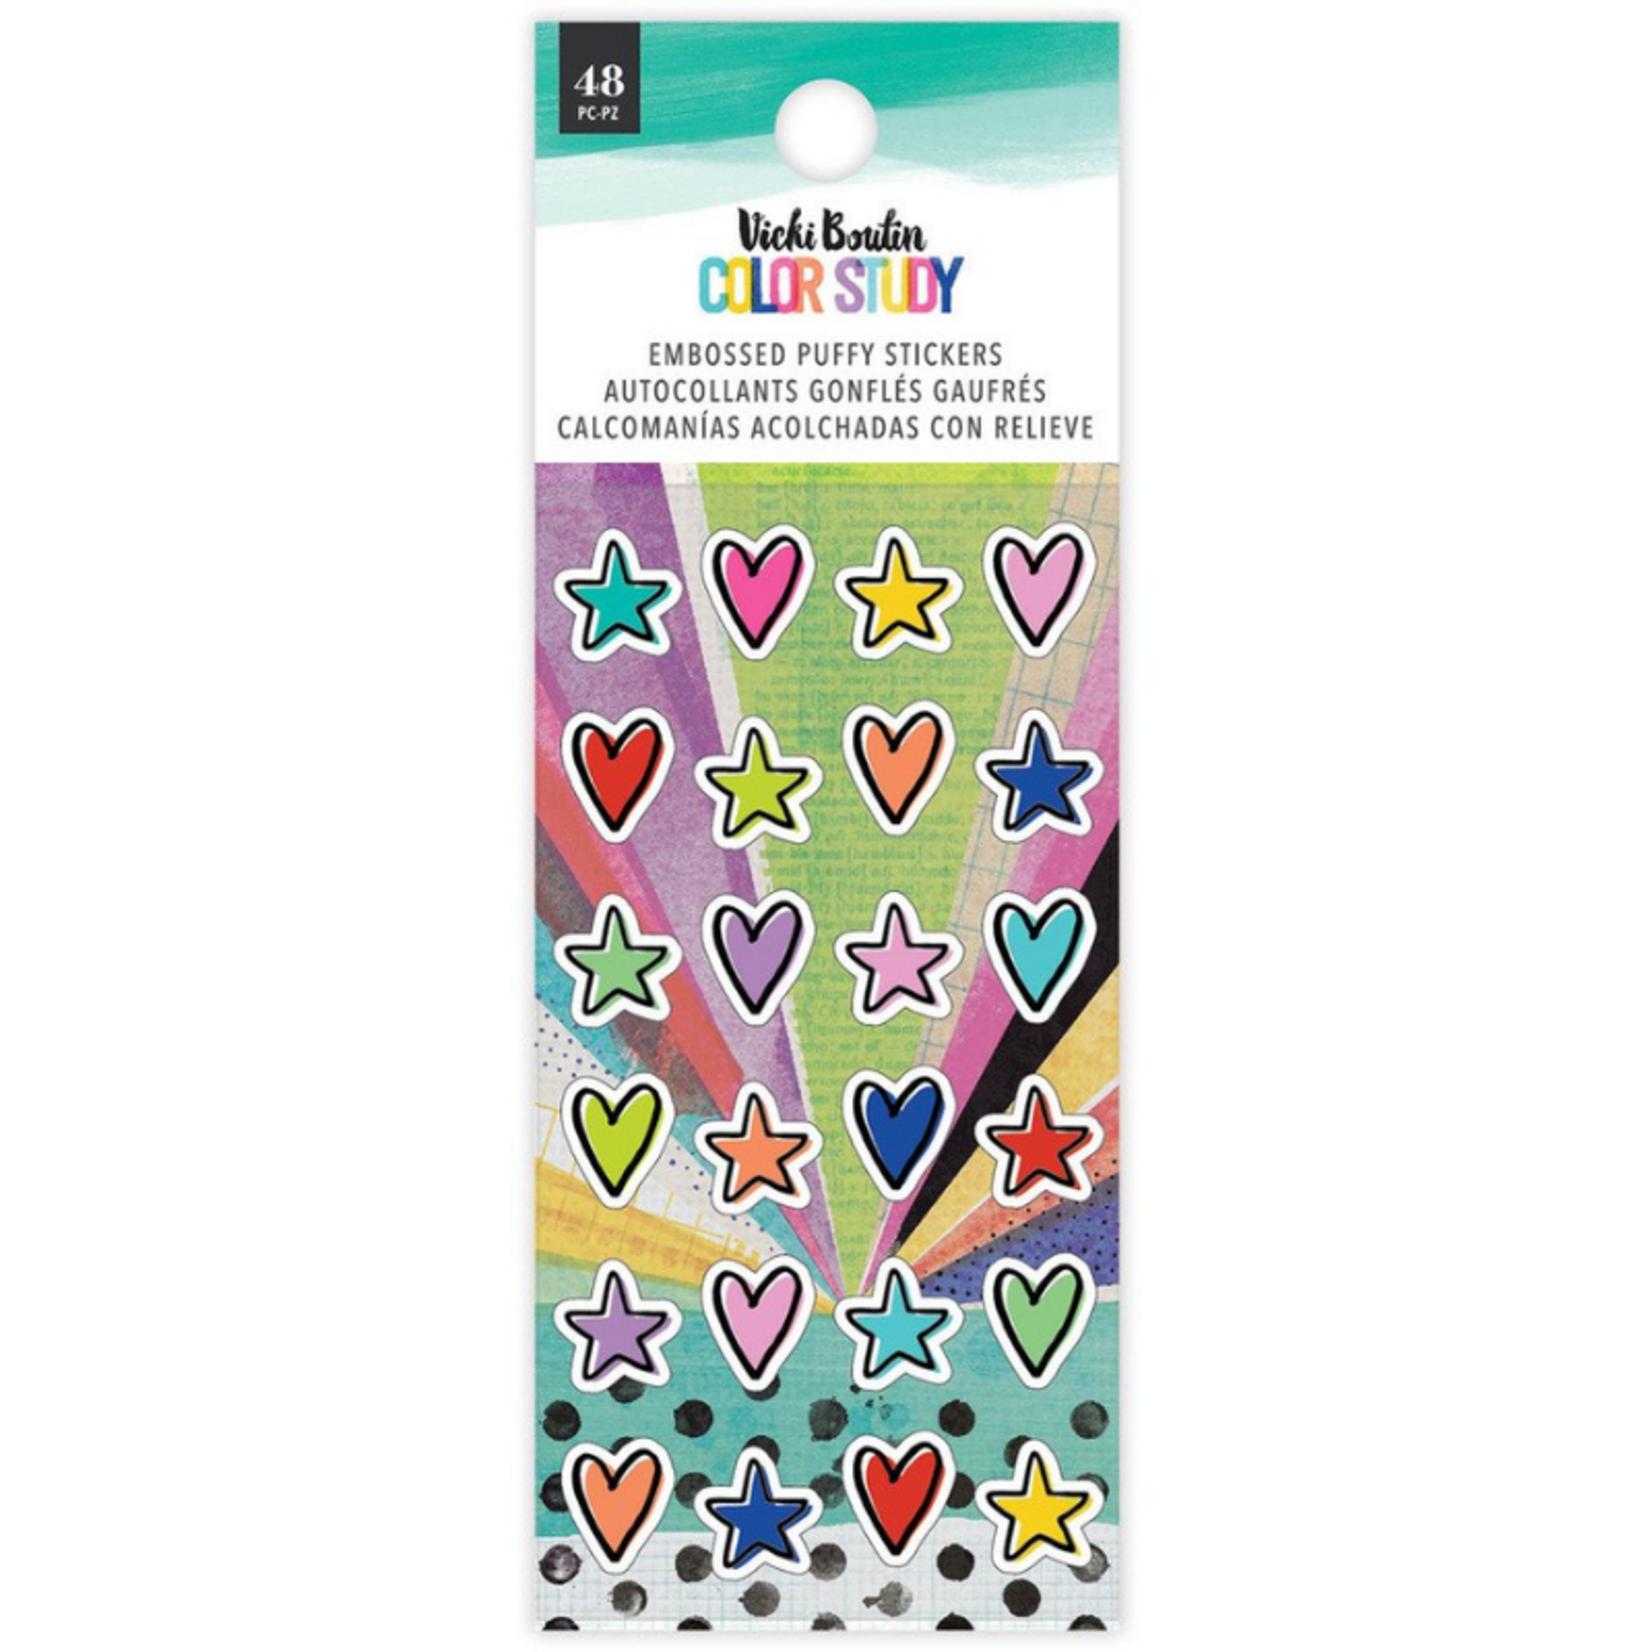 Vicki Boutin Vicki Boutin - Color Study - Embossed Puffy Stickers